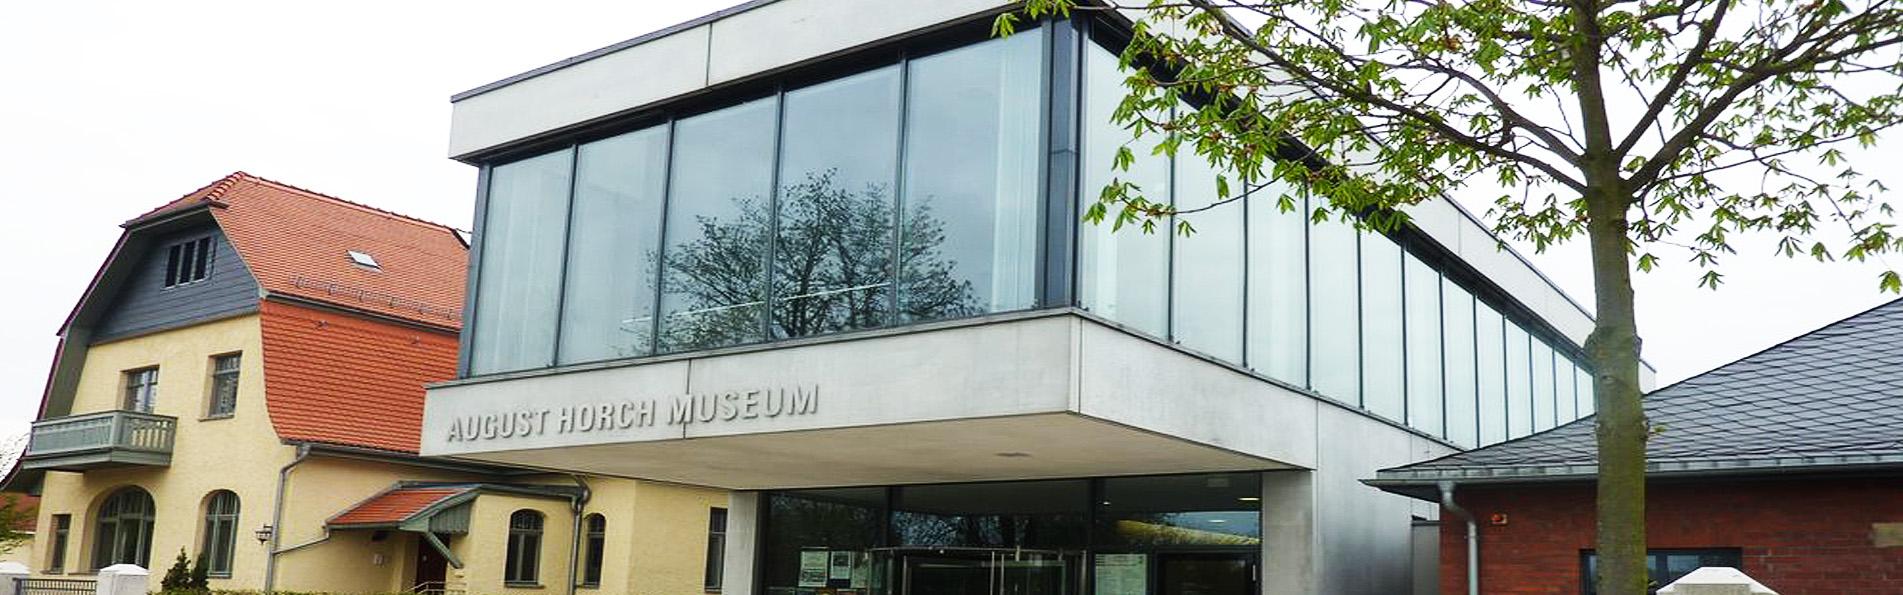 Horch-Museum